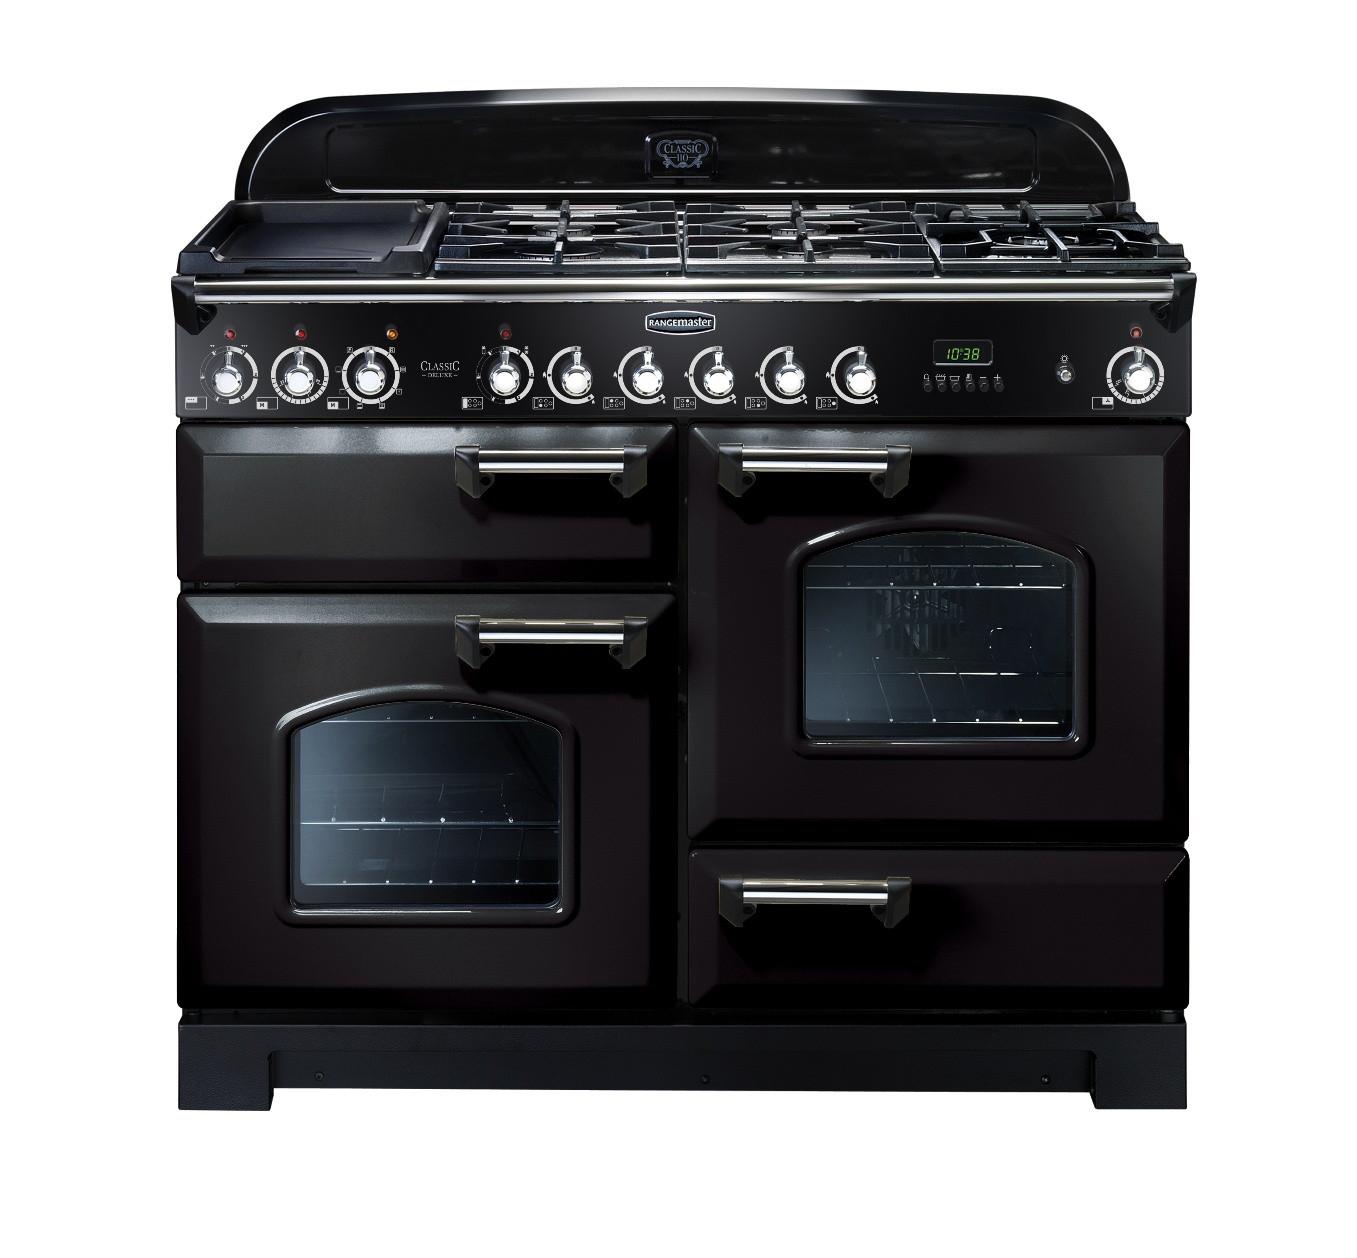 Rangemaster Classic Deluxe 110 Dual Fuel Range Cooker Black/Chrome Trim CDL110DFFBL/C 79780